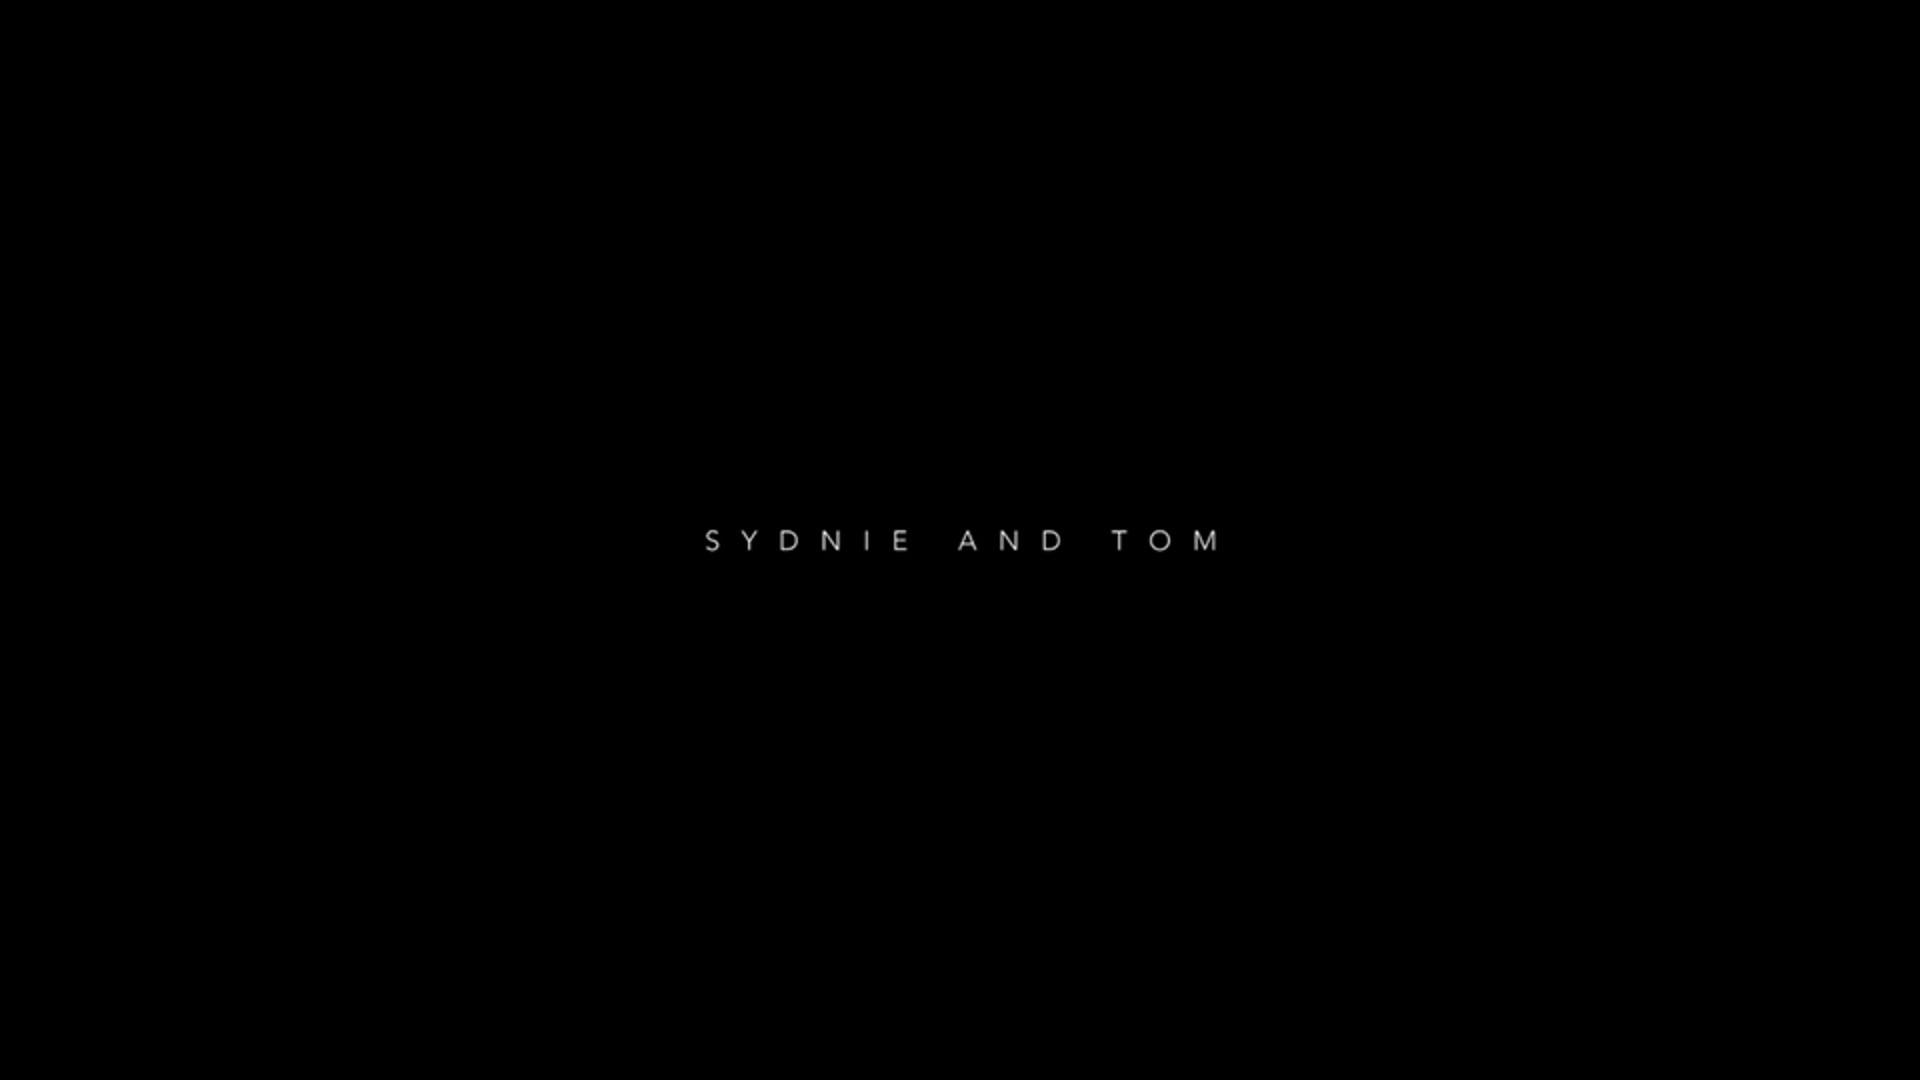 Sydnie + Tom